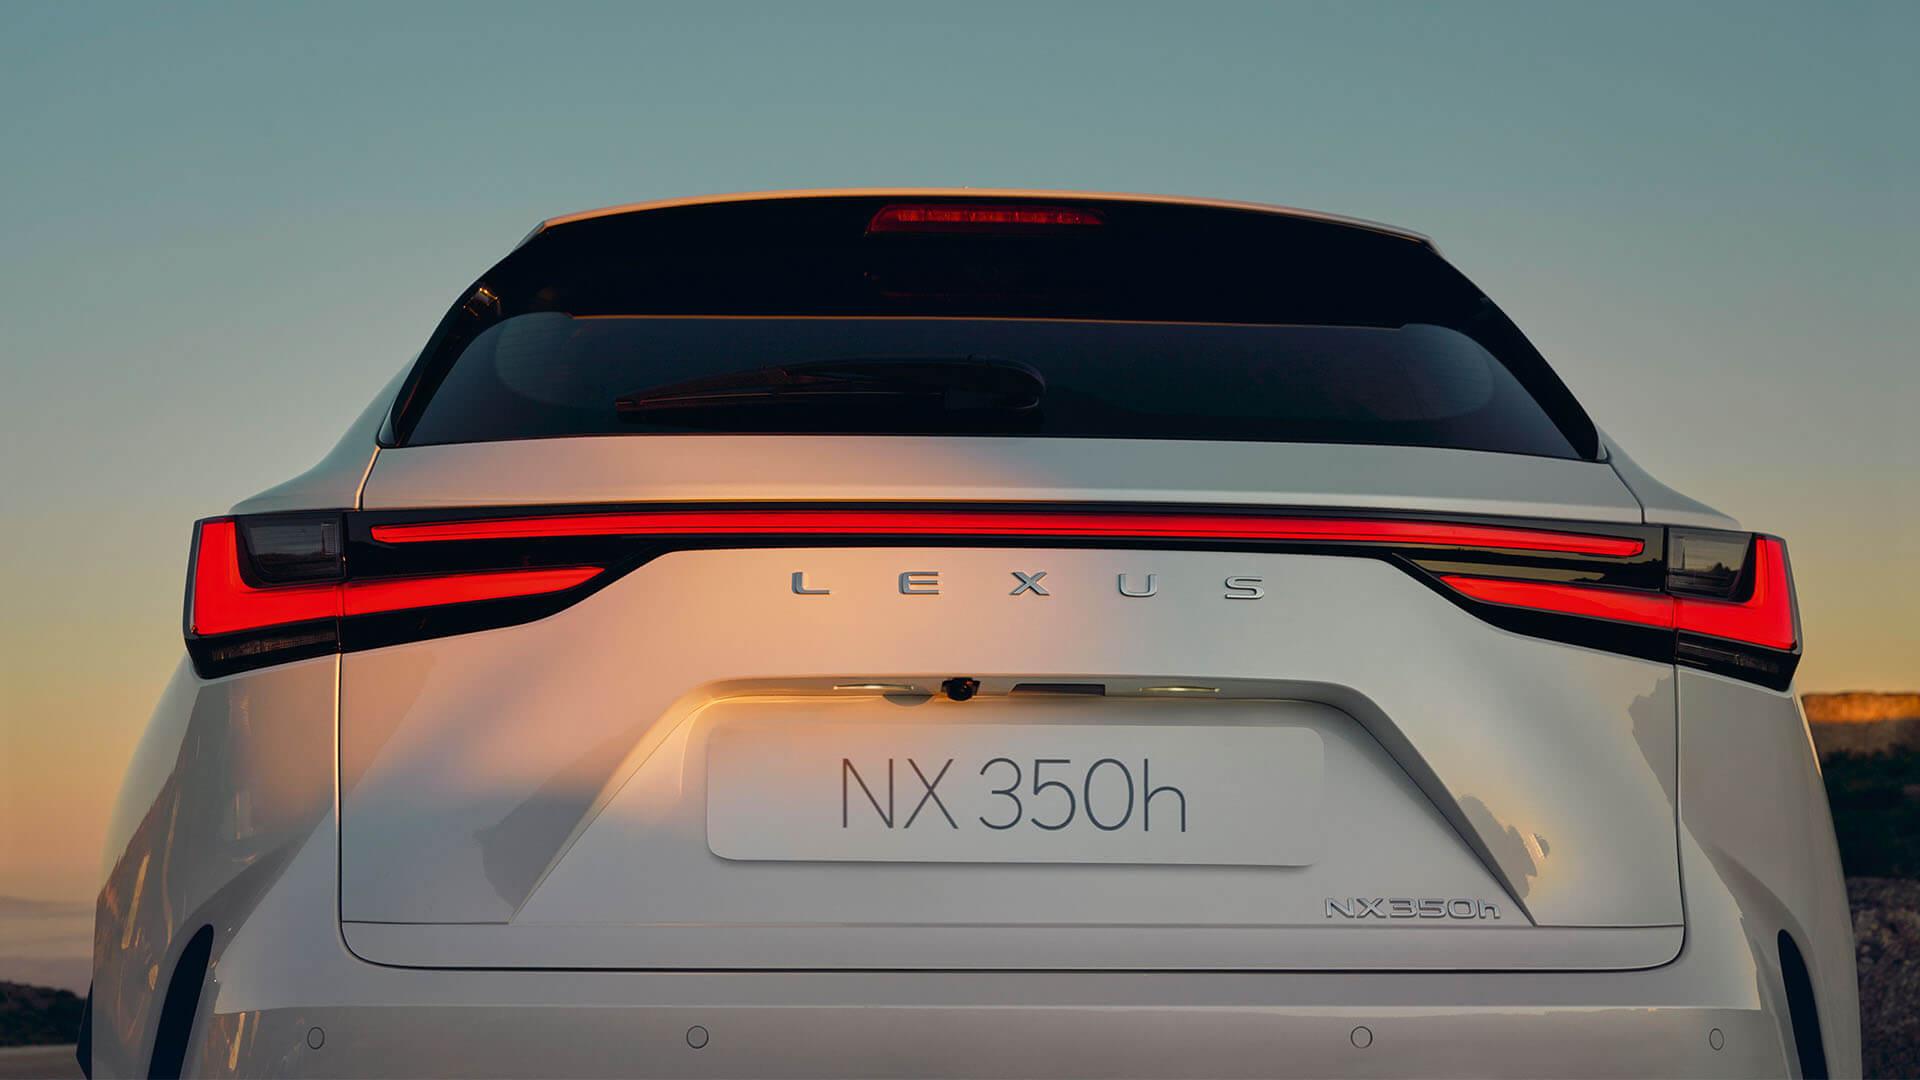 2021 lexus nx experience exterior back new lexus blade light